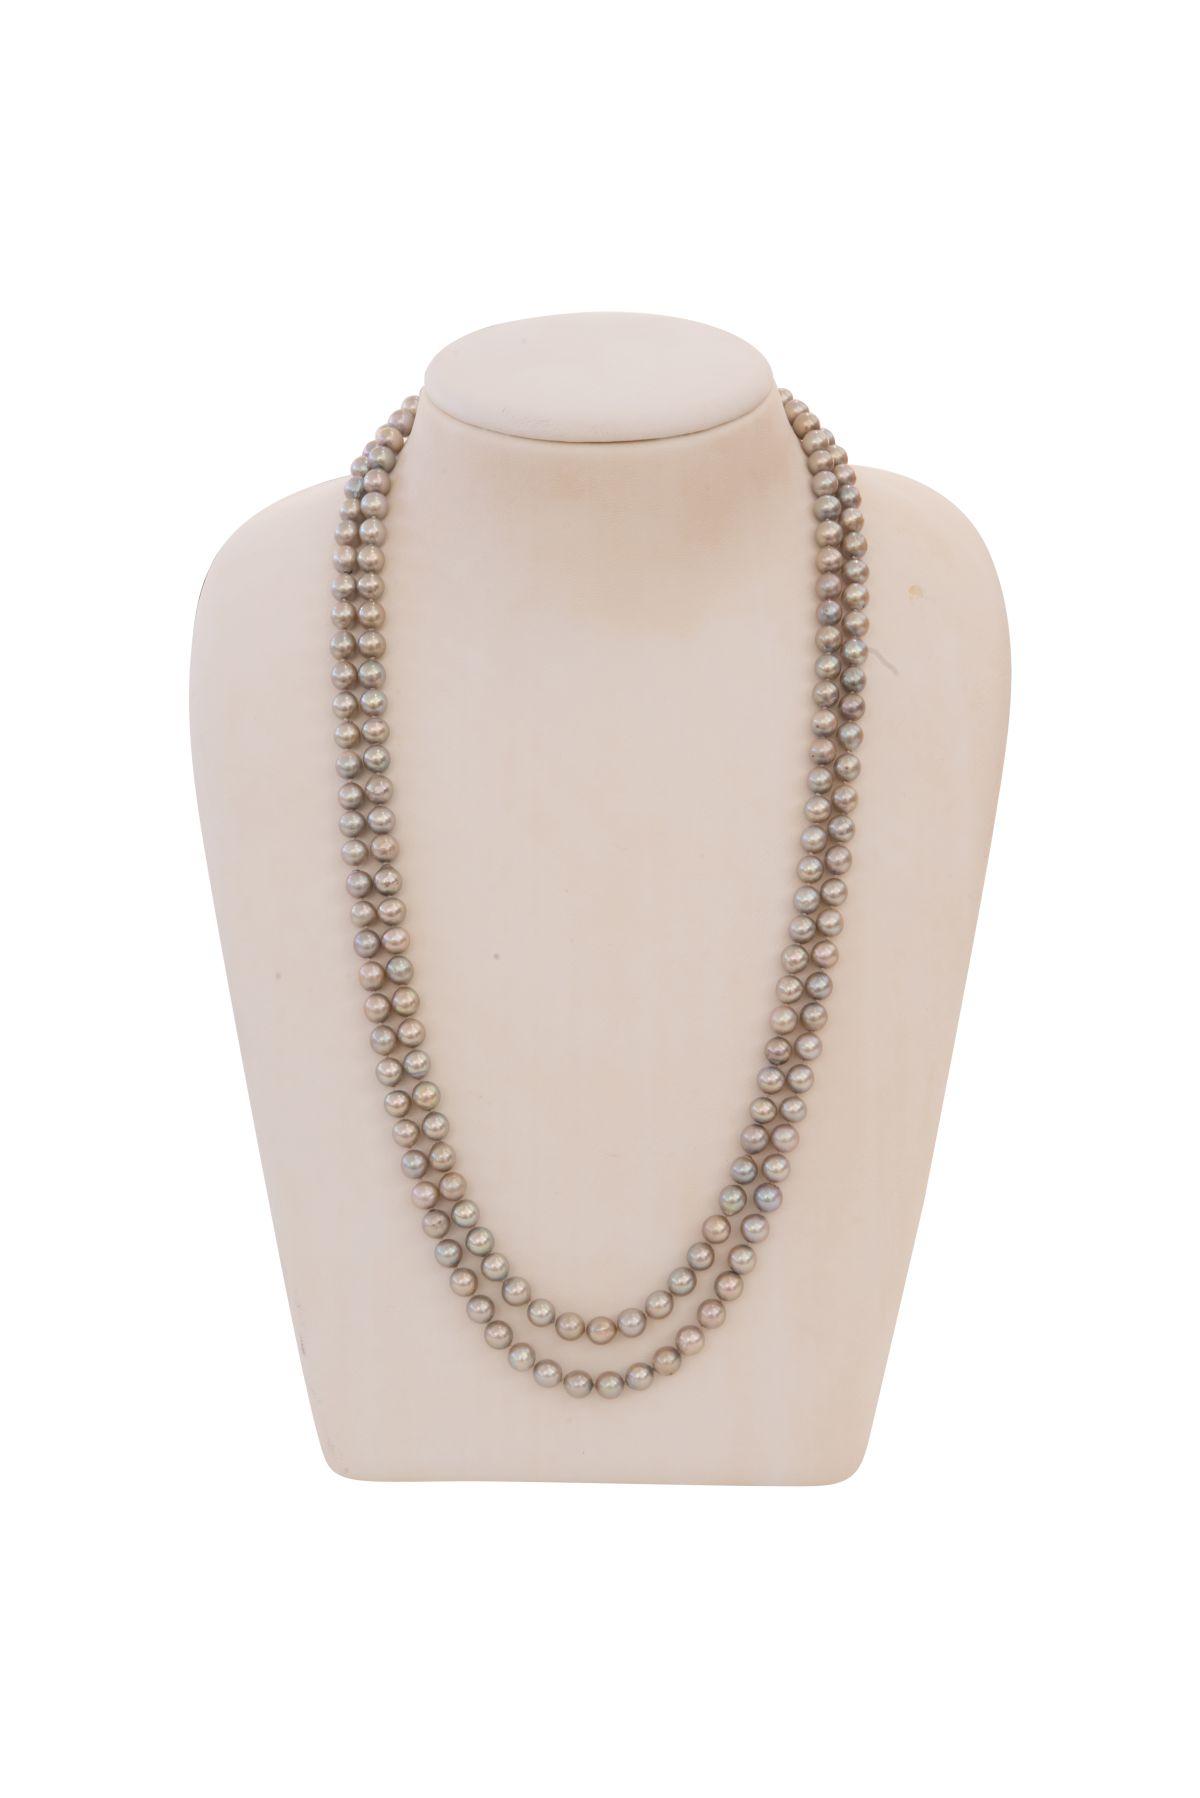 #219 pearlnecklace | Perlenkette Image